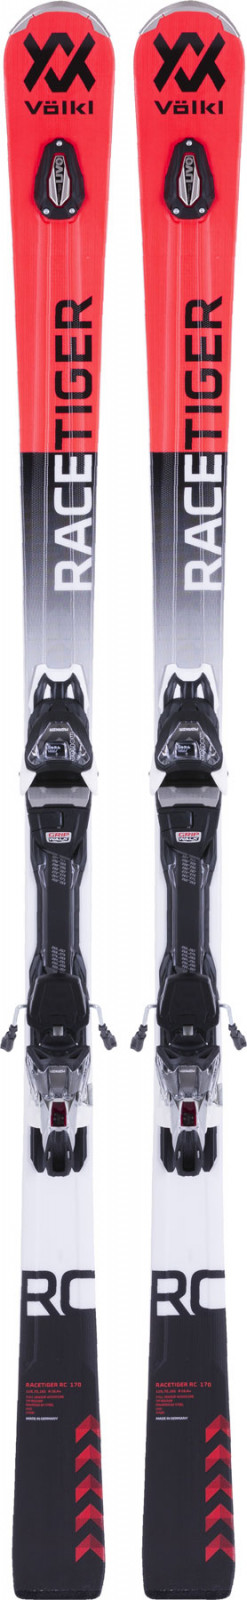 Völkl Racetiger RC Red + vMotion 11 GW